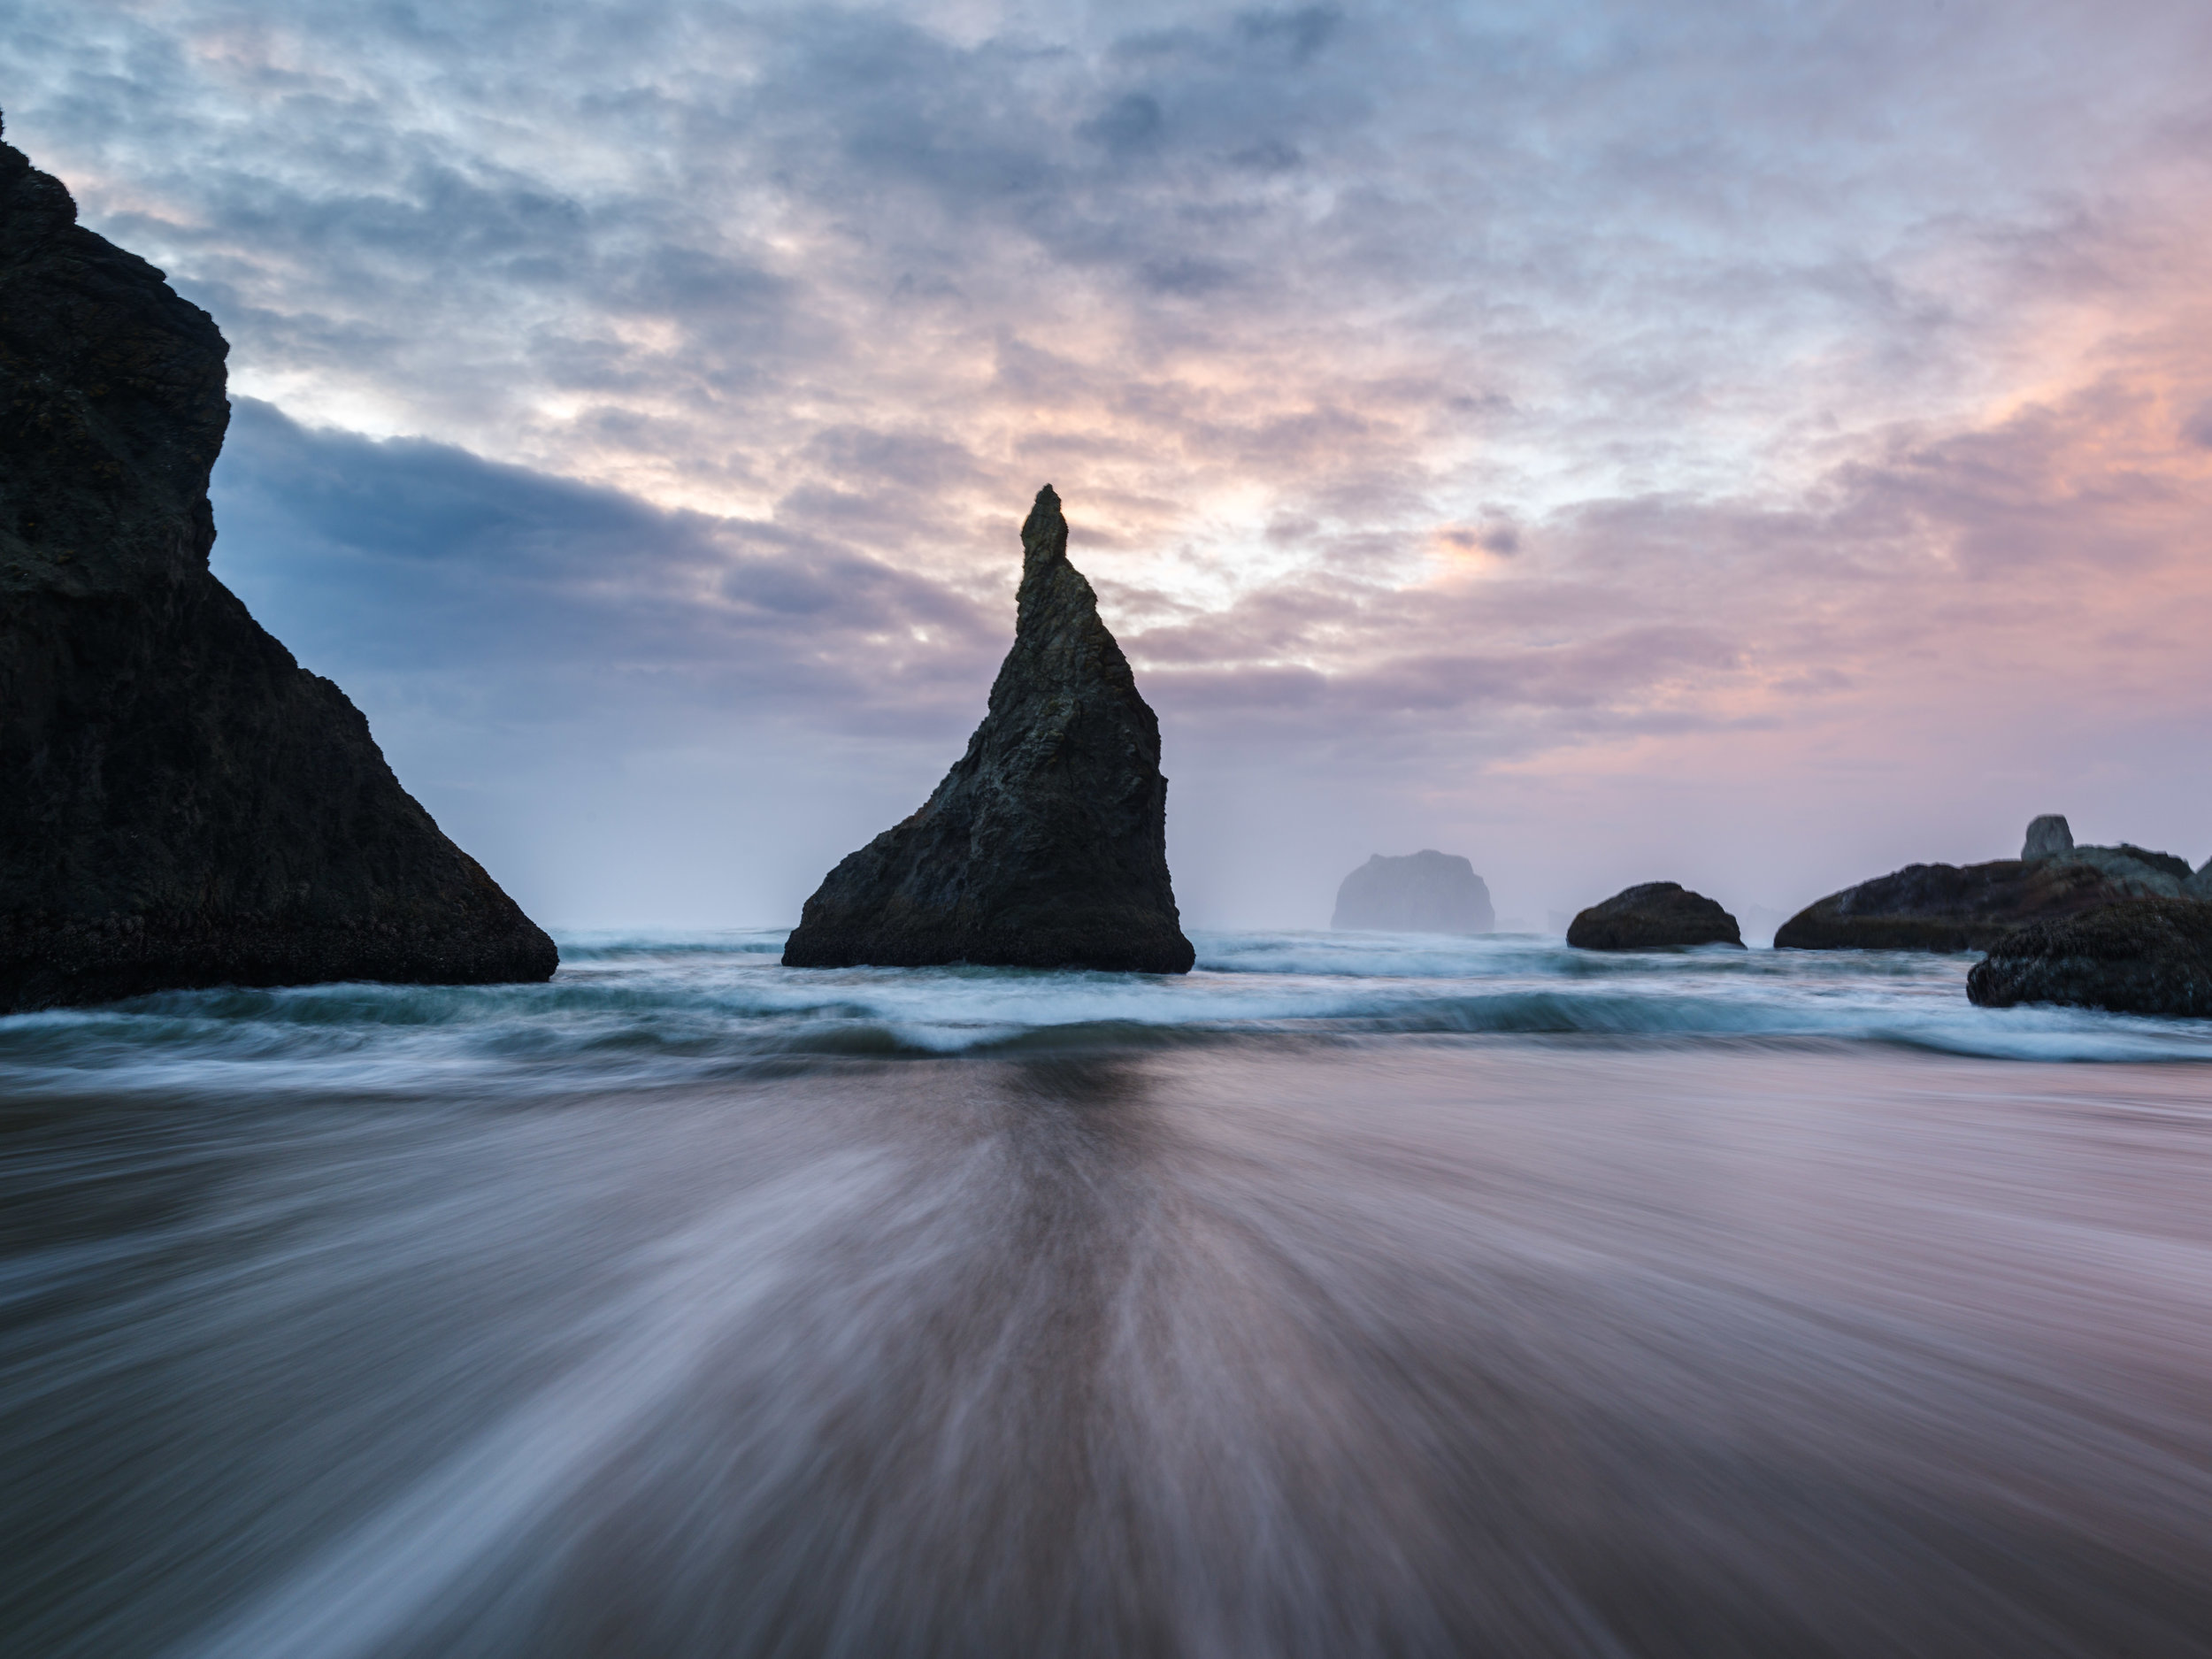 Bandon Beach, Oregon coast |Photo by Jonathan Irish